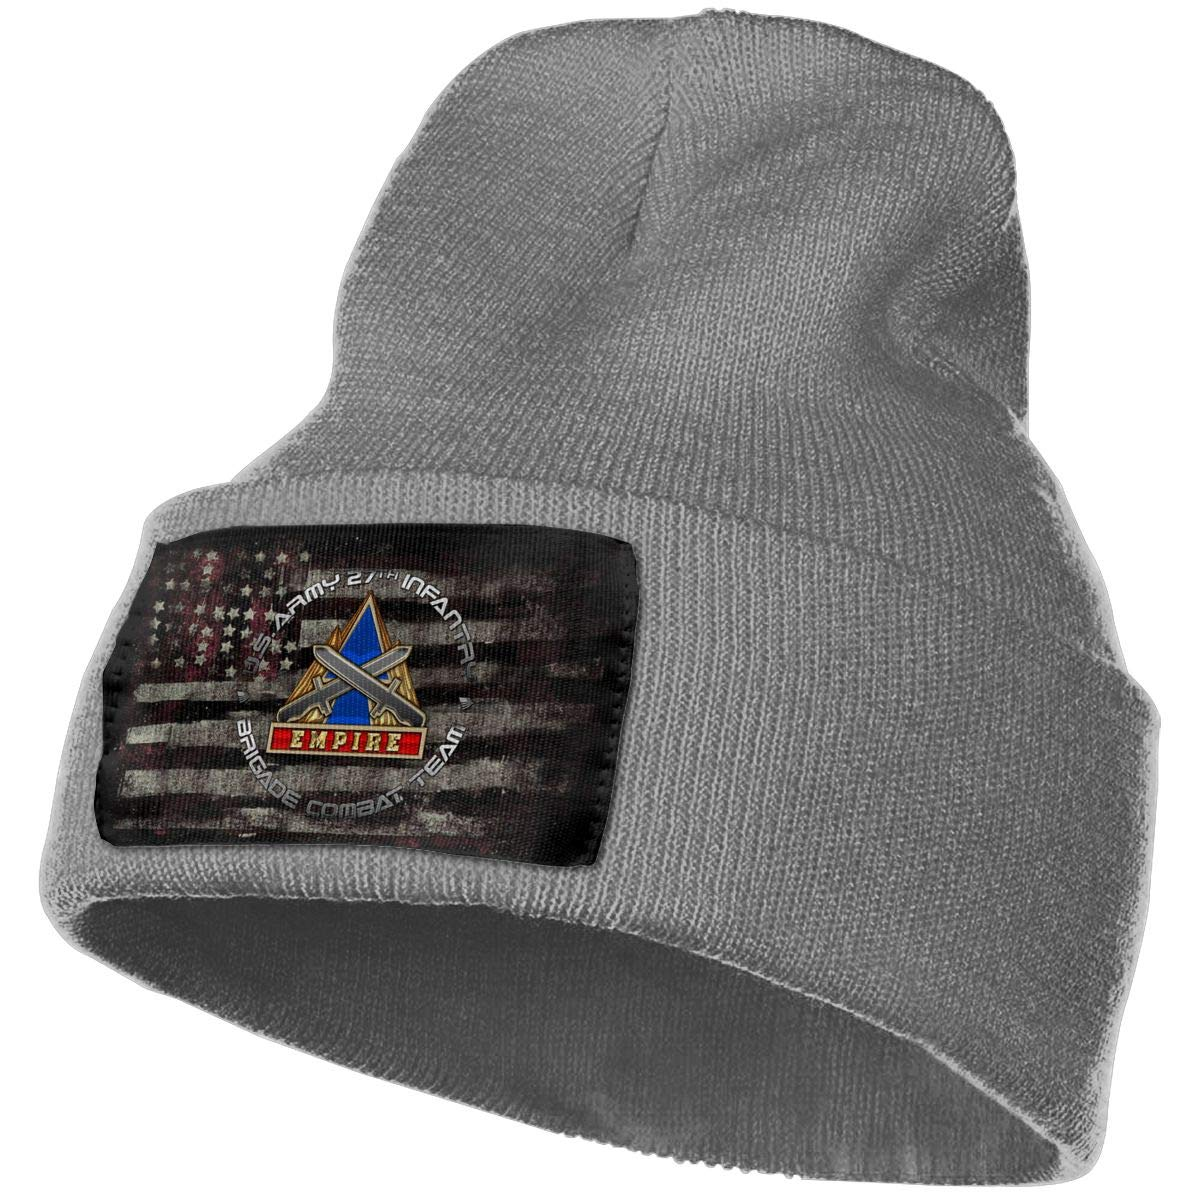 27th Infantry Brigade DUI Mens Beanie Cap Skull Cap Winter Warm Knitting Hats.